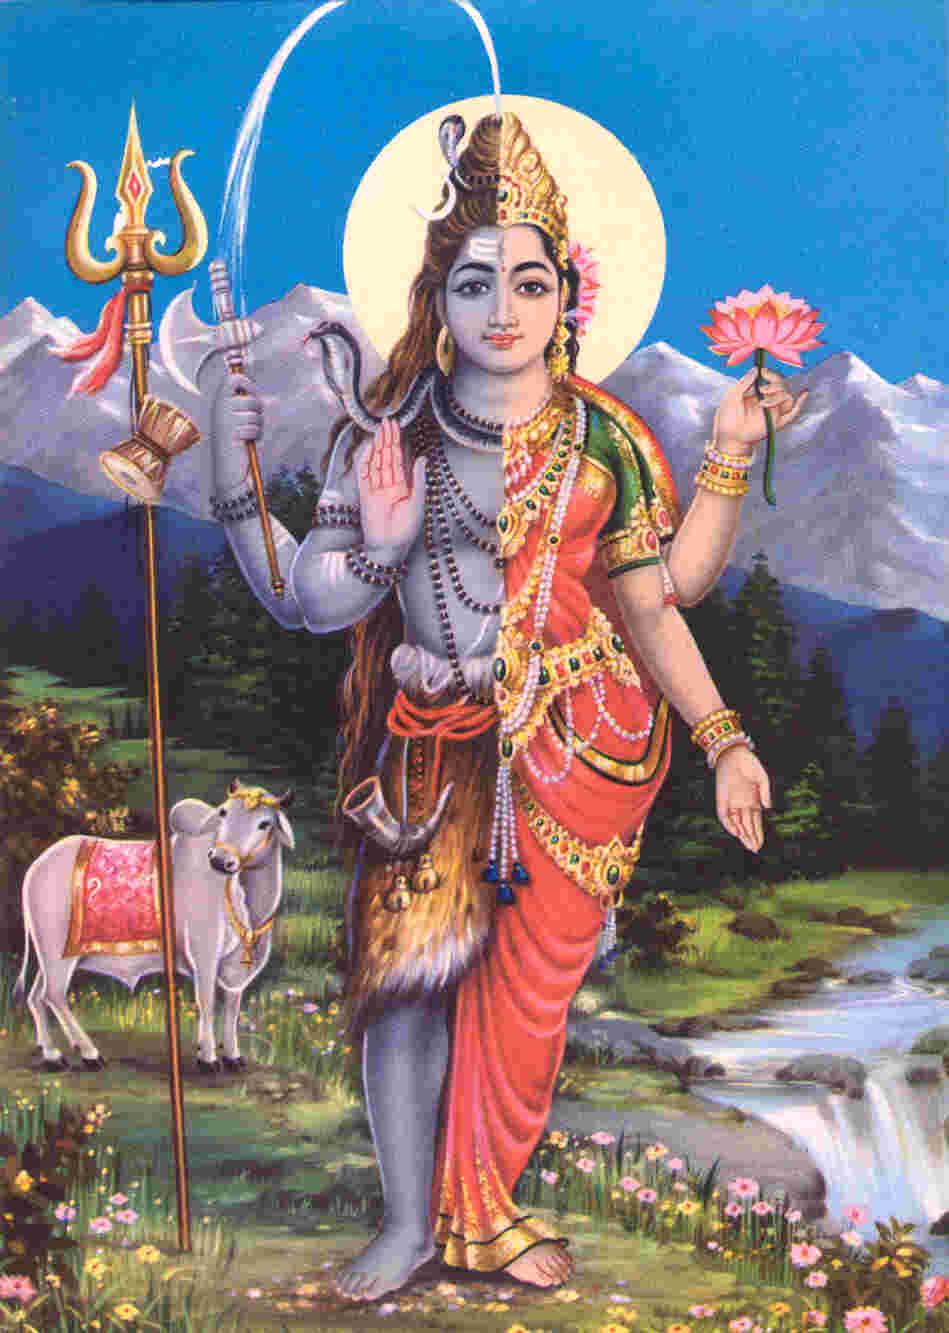 Hindu Deities - All About the Goddesses |Indian Hindu Gods